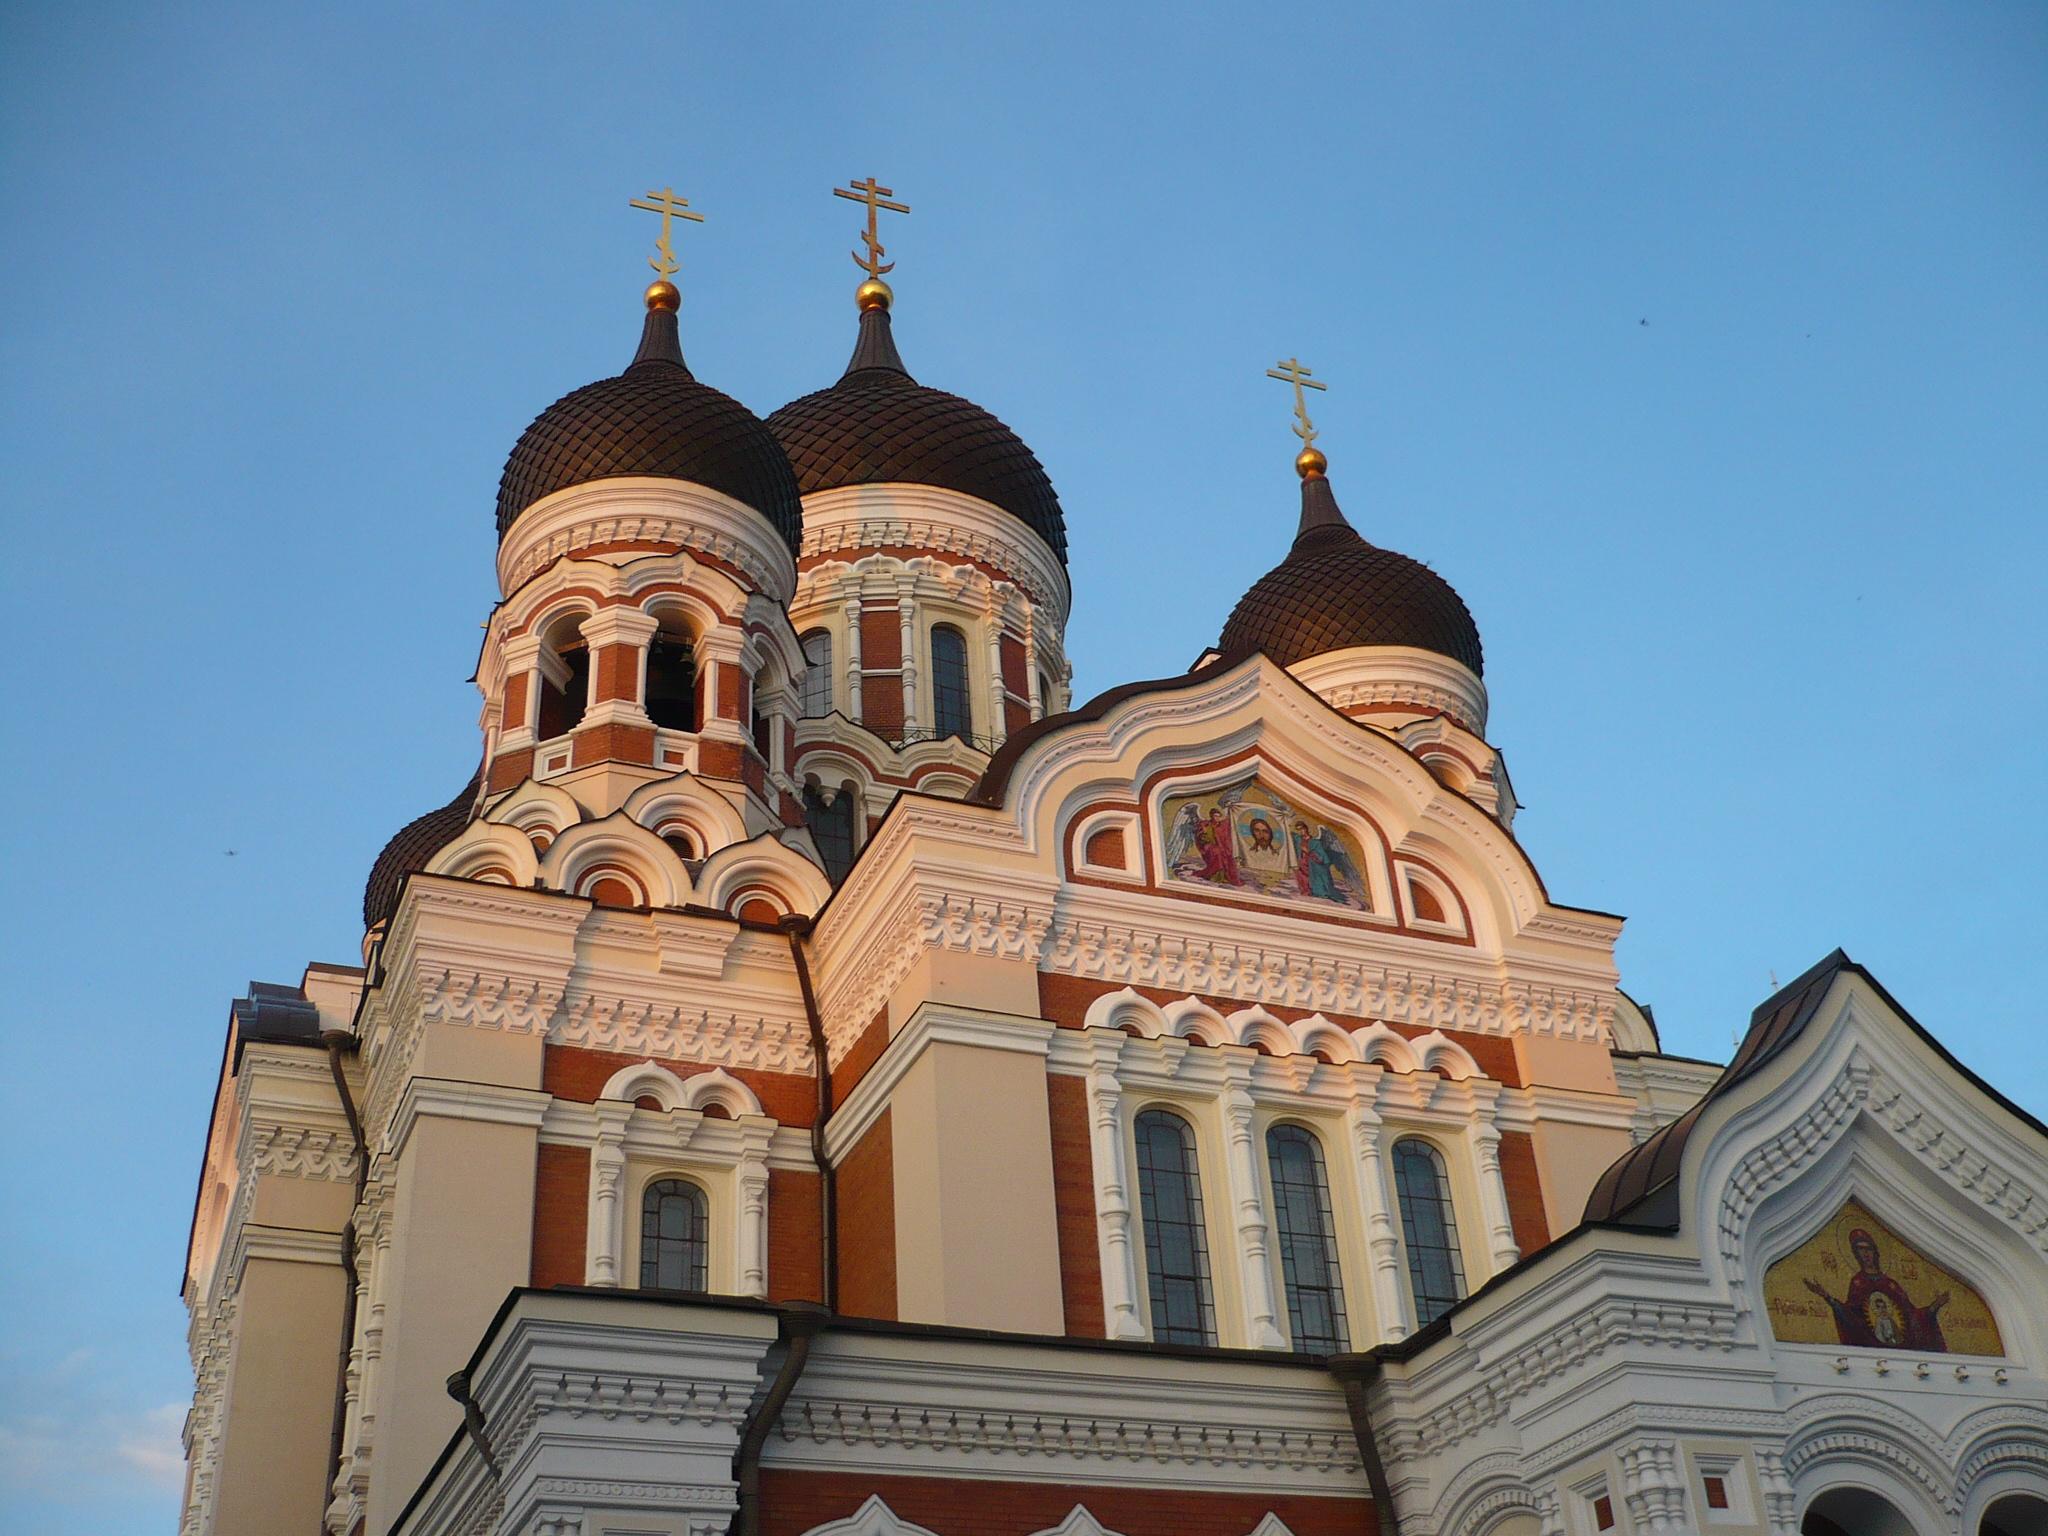 Tallinn - Alexander Nevsky Cathedral